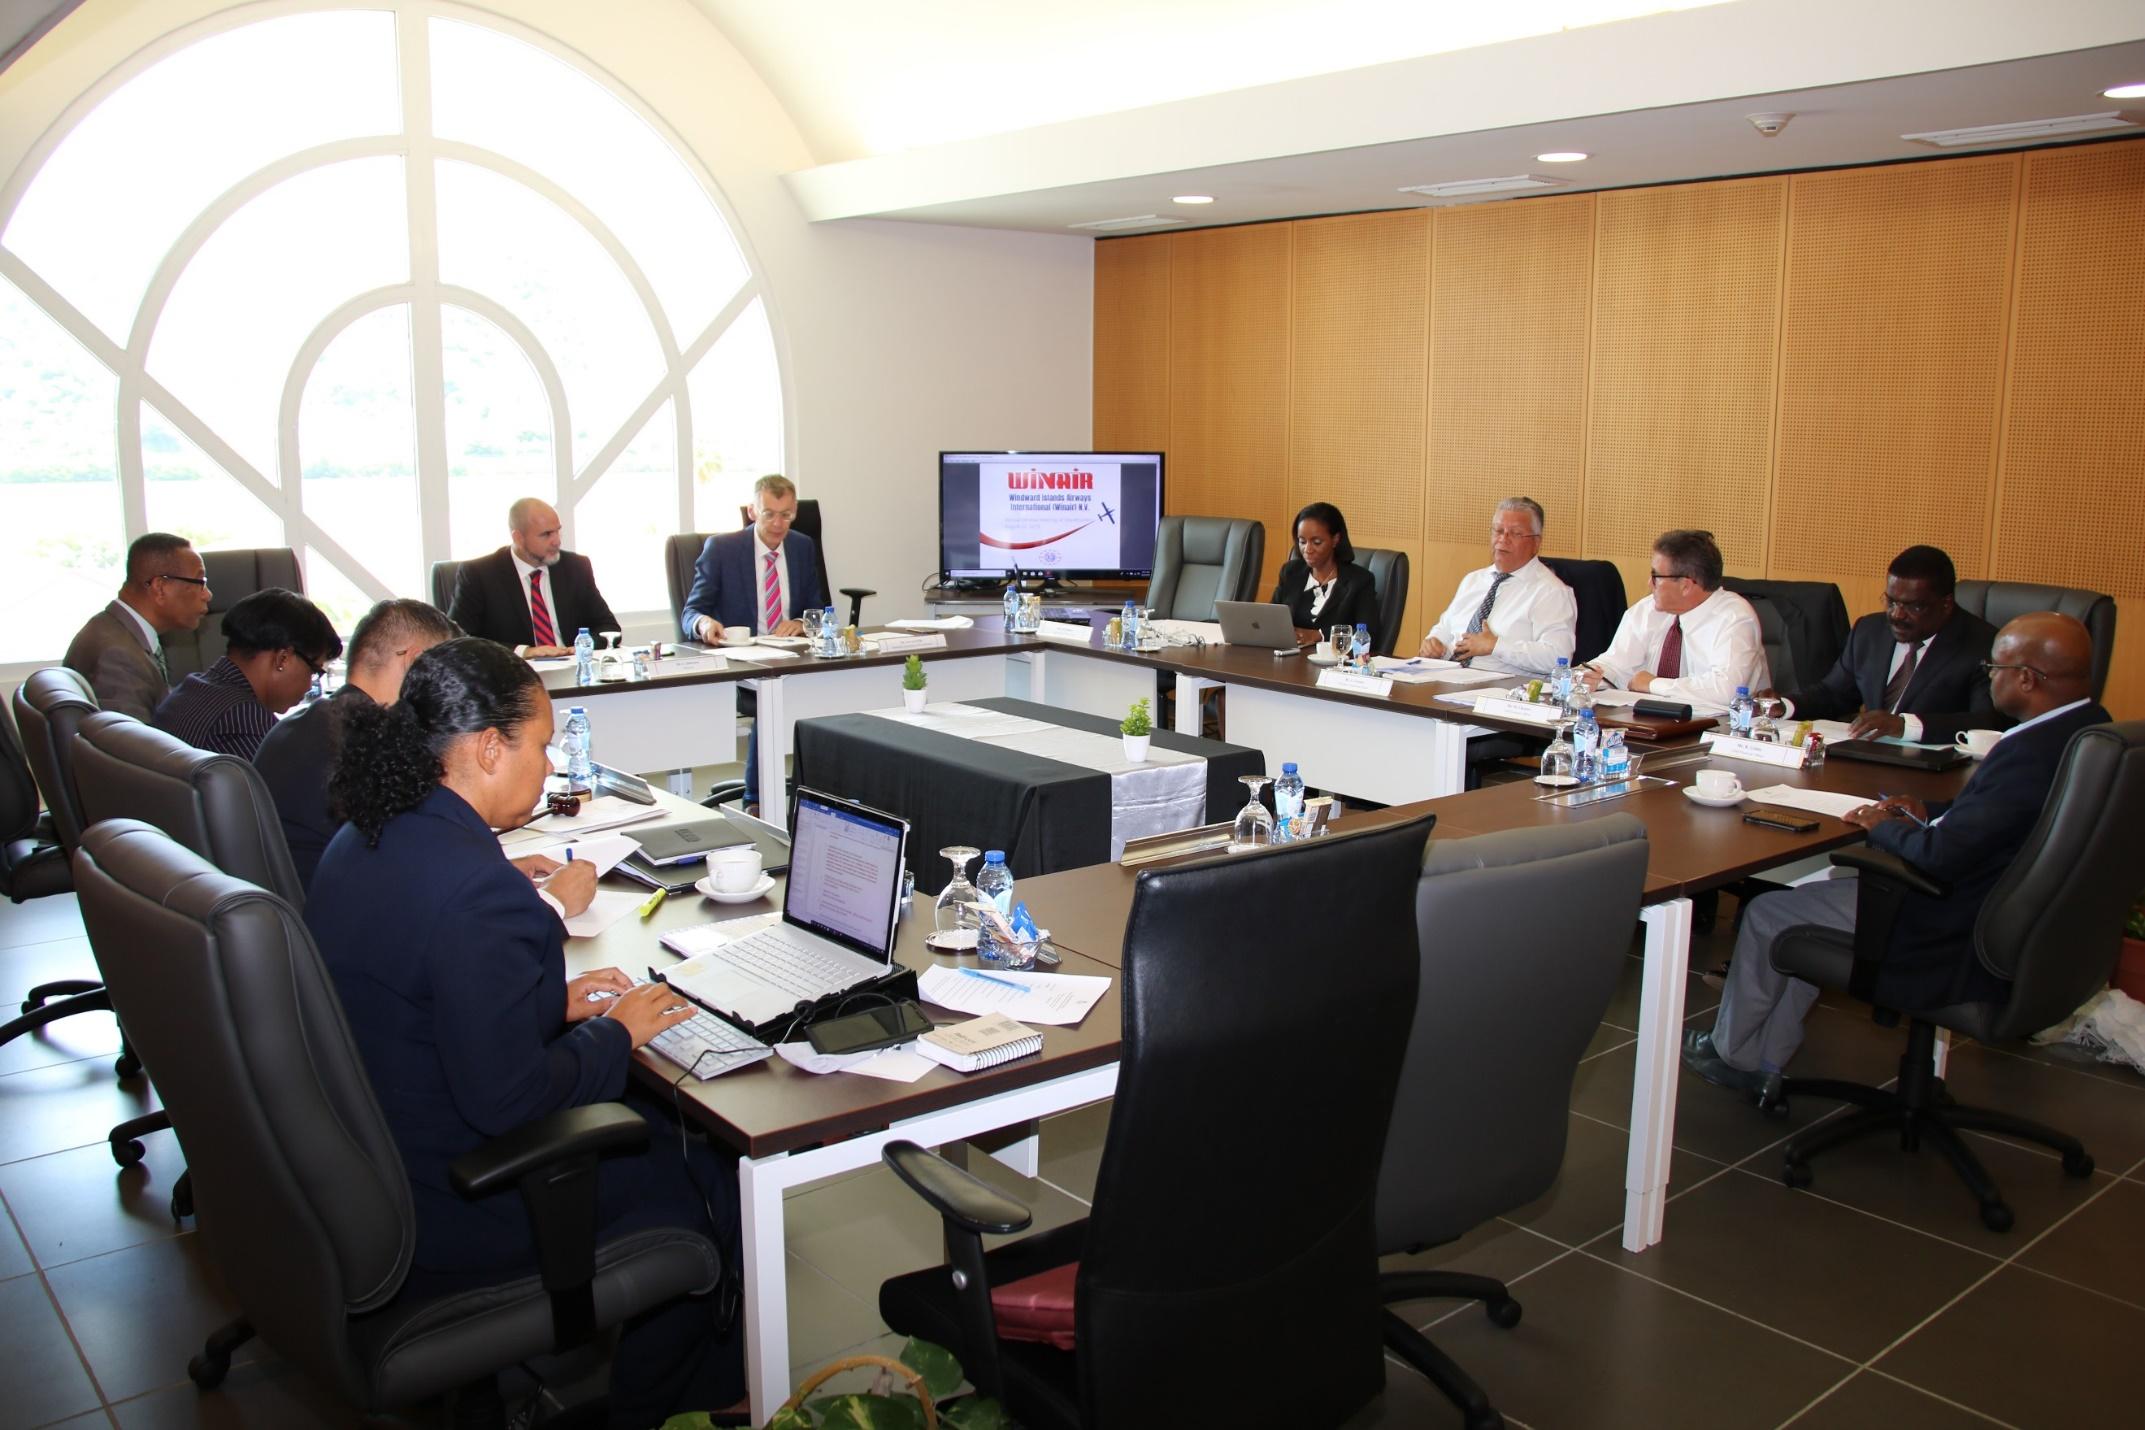 Winair Annual Shareholders Meeting Aug 2019